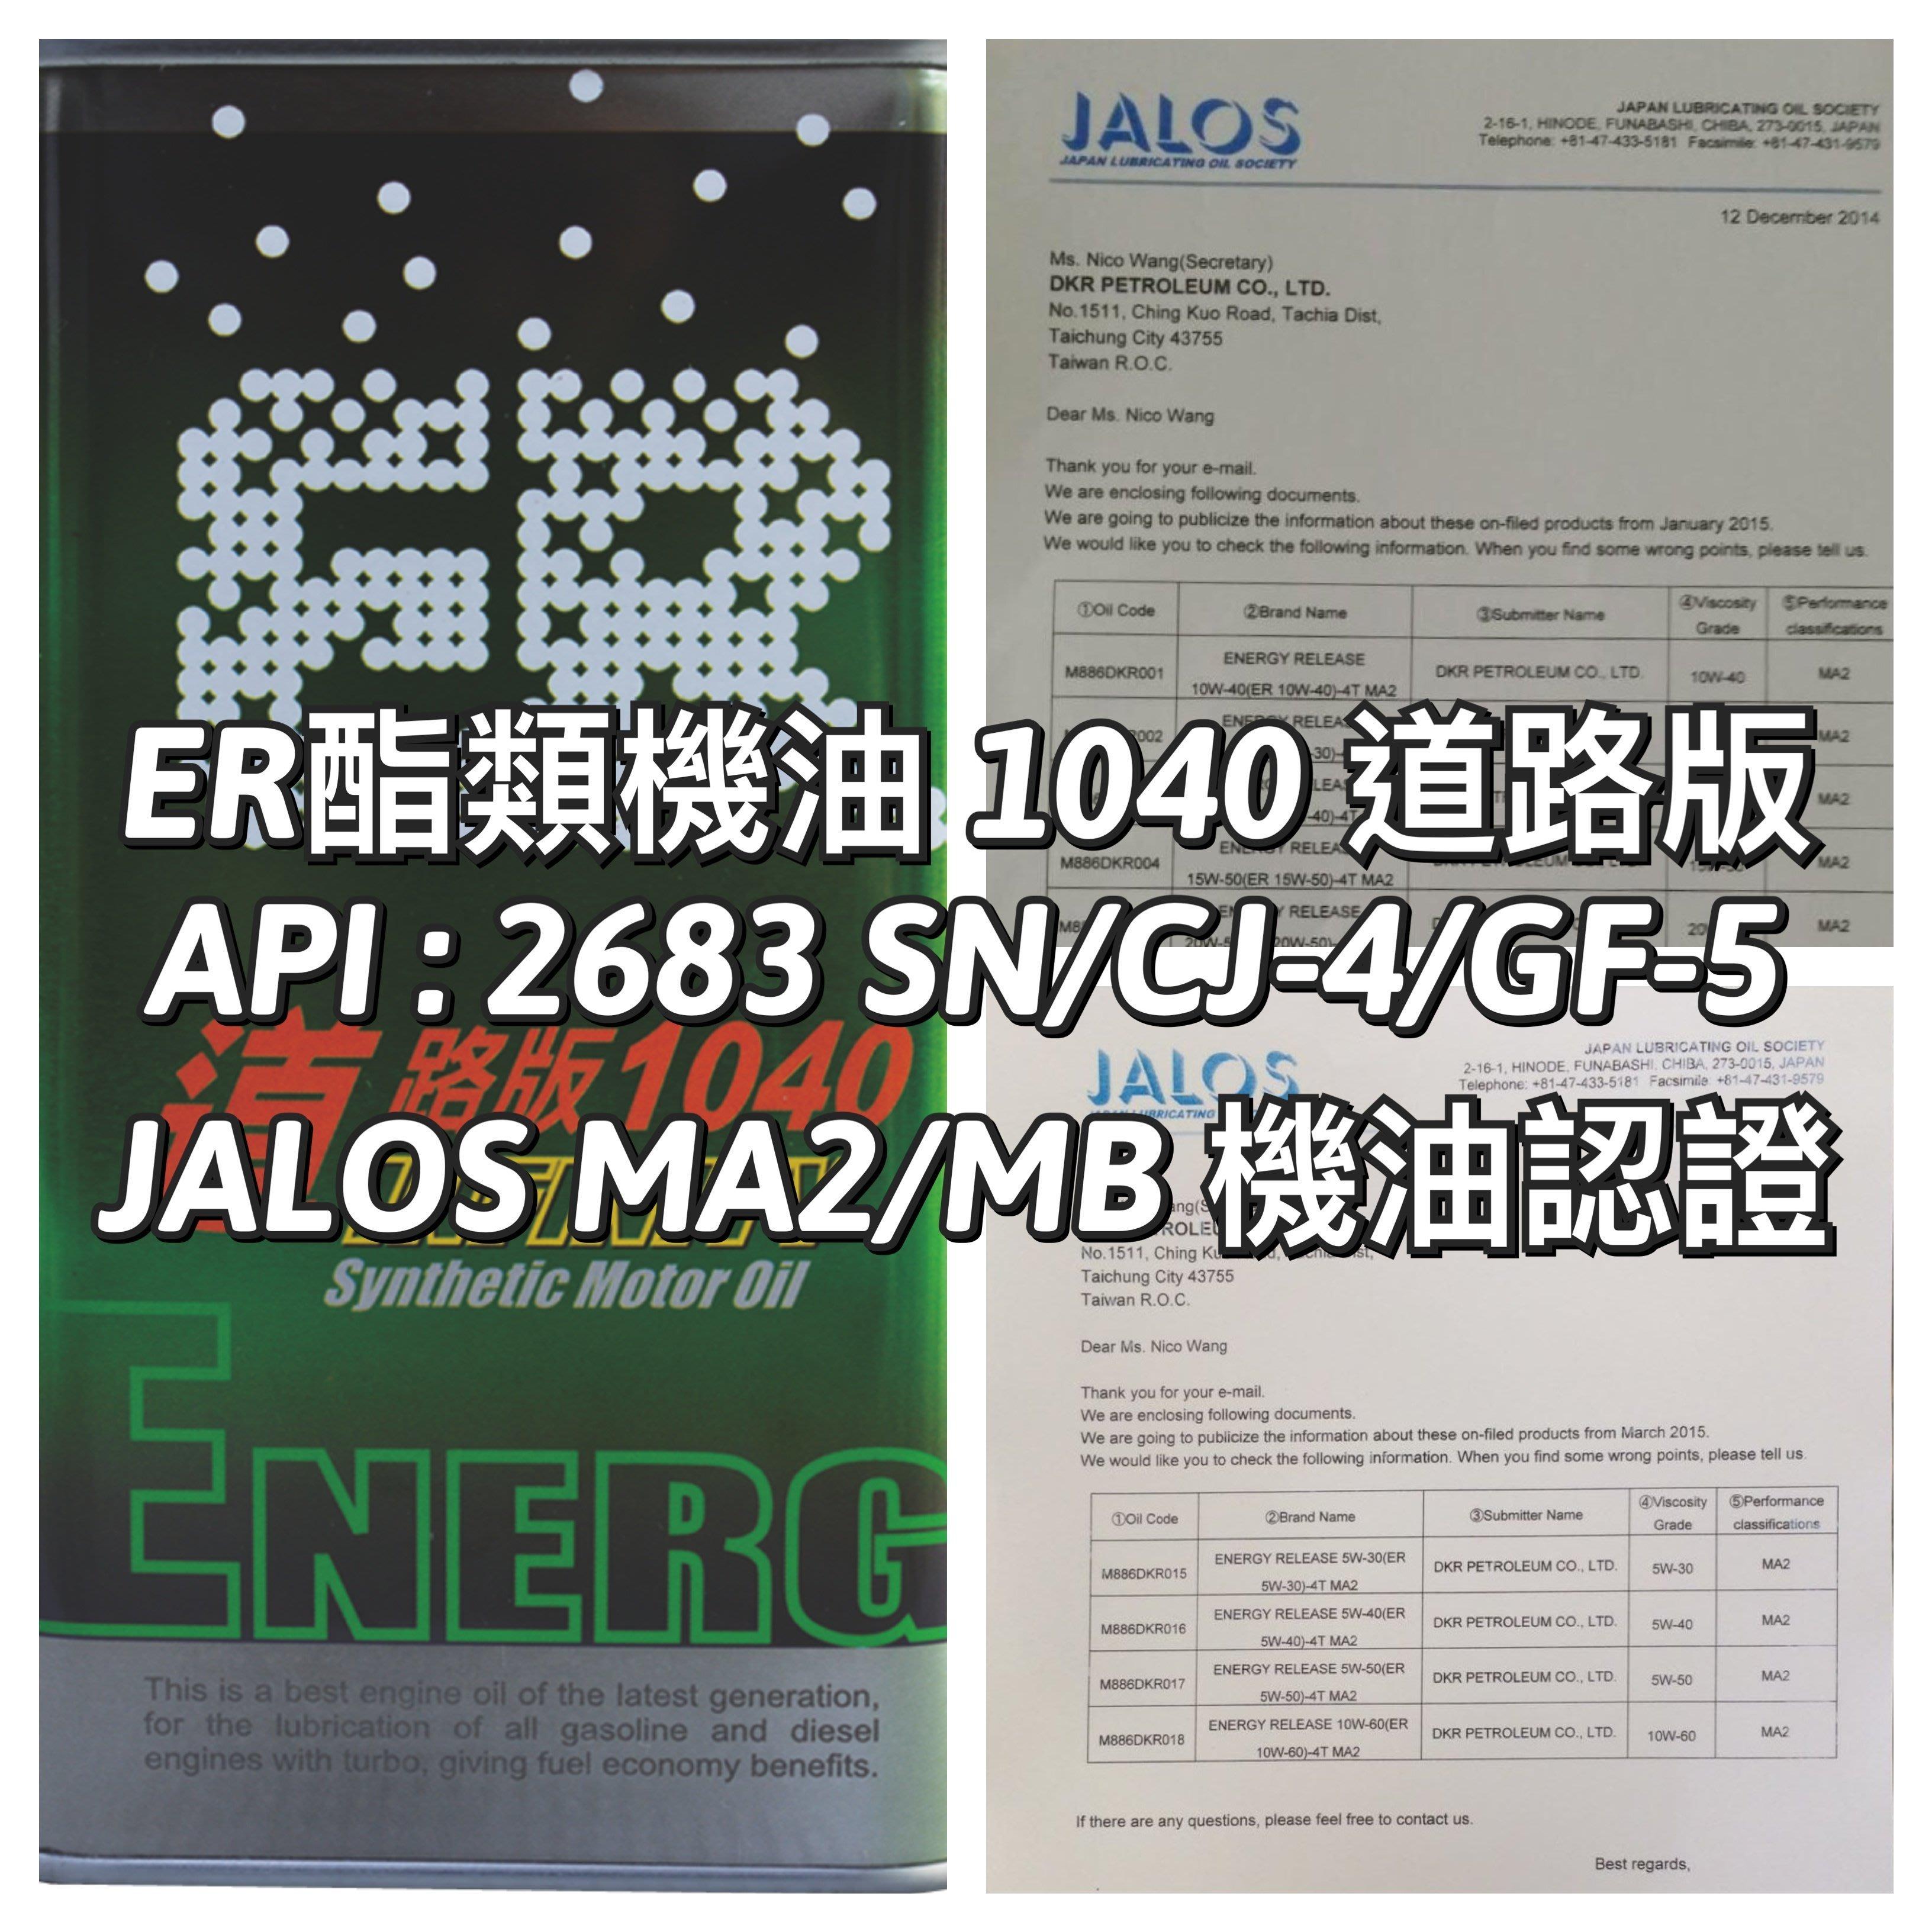 ER酯類機油 4T四行程機油 10W40 小綿羊 輕型機車 速克達 可用 光陽 山葉 宏佳騰